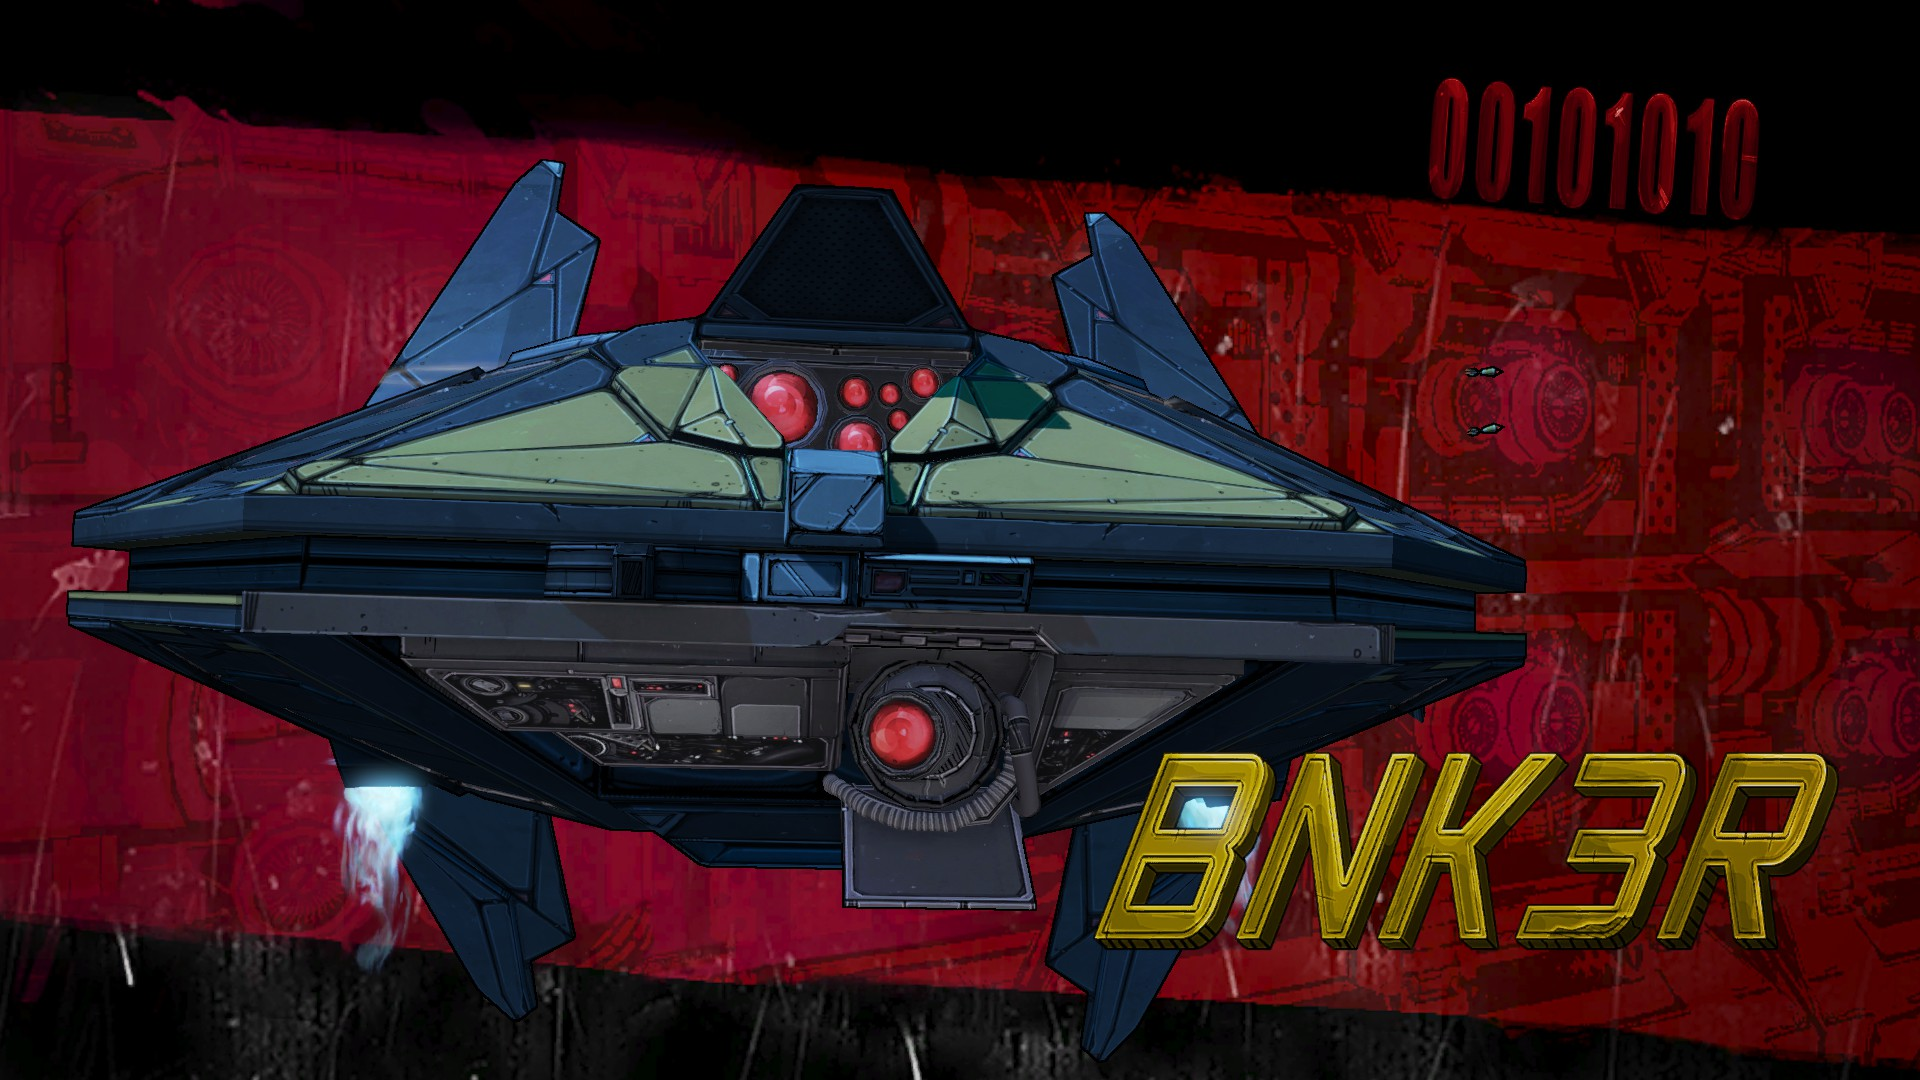 BNK3R